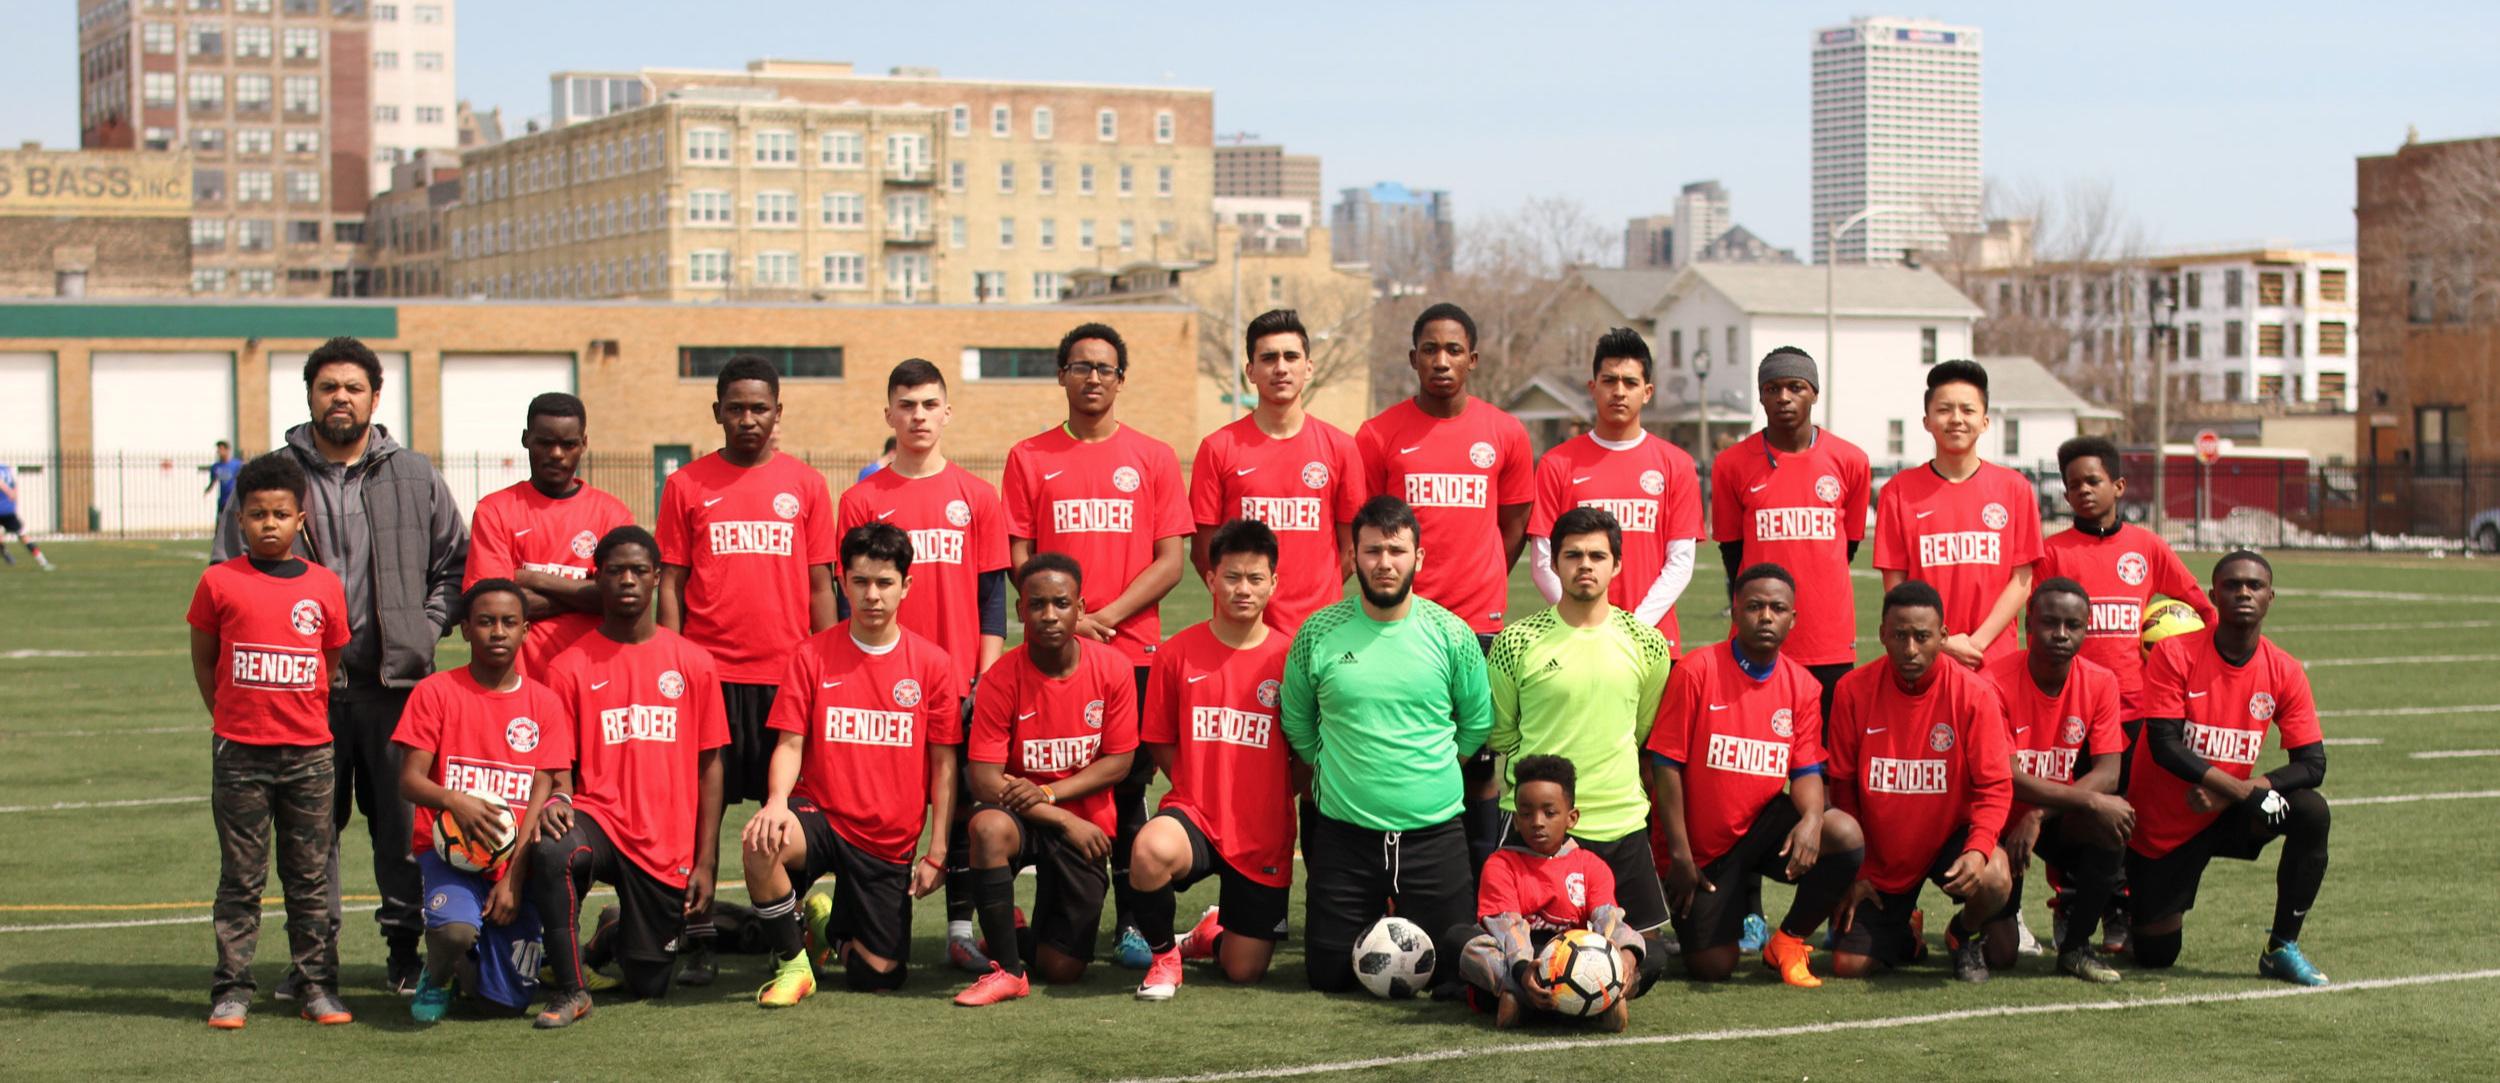 2018 Team Photo